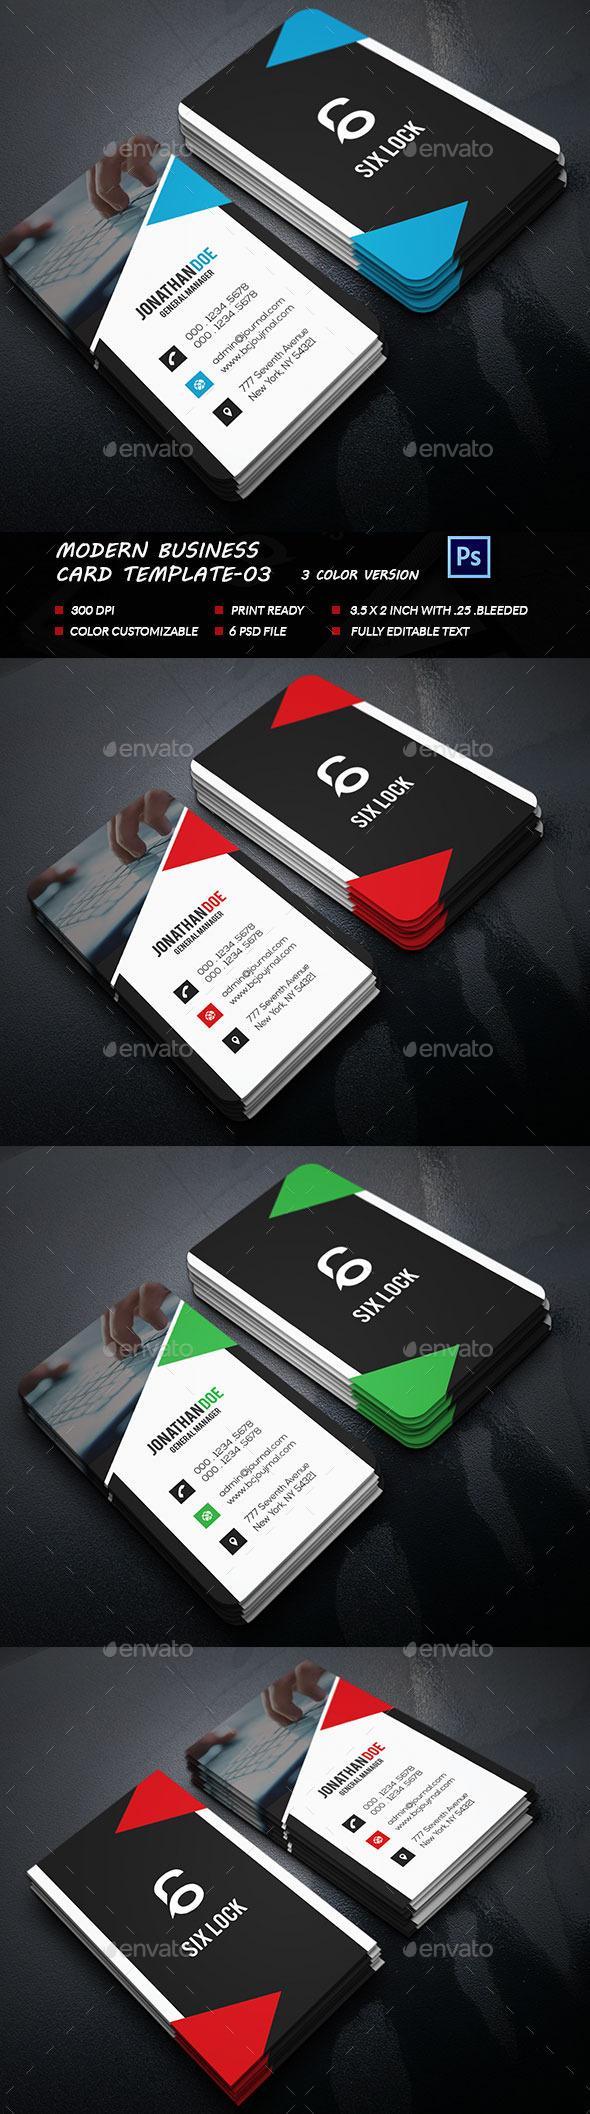 Modern Business Card Template-03 - Business Cards Print Templates